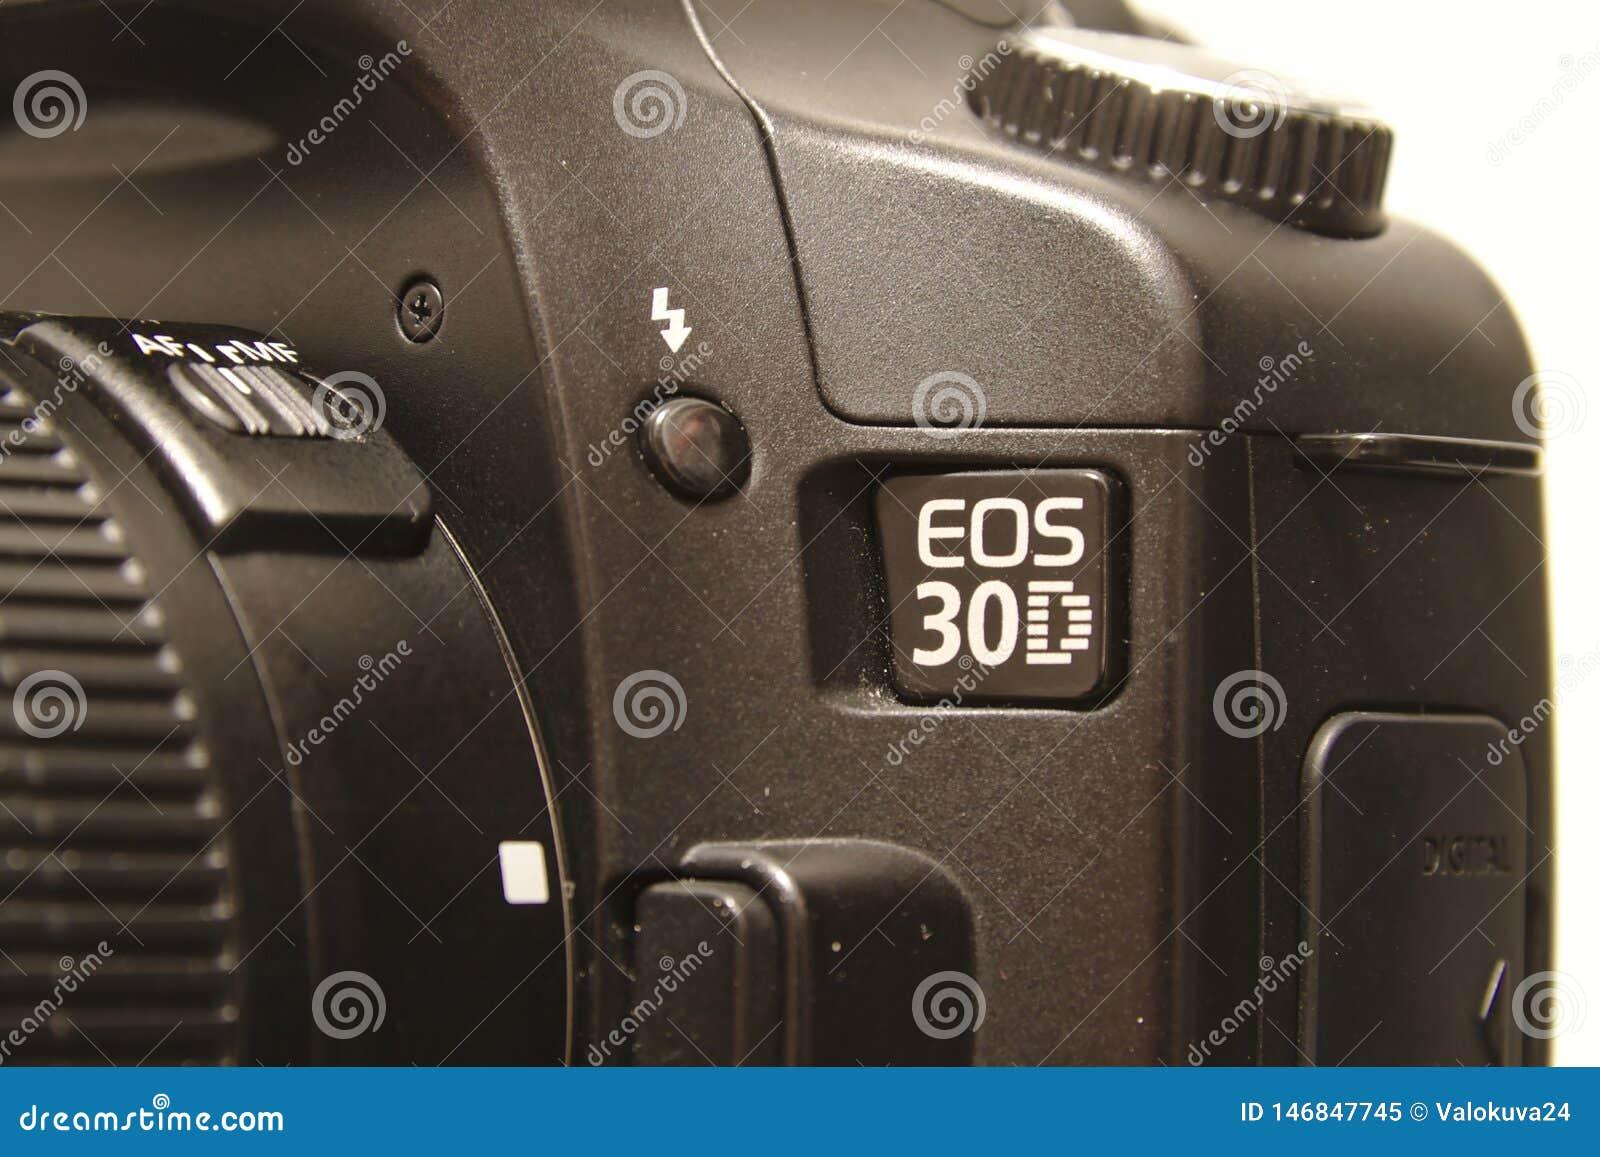 Canon Eos 30d Editorial Image Image Of Closeup Dslr 146847745